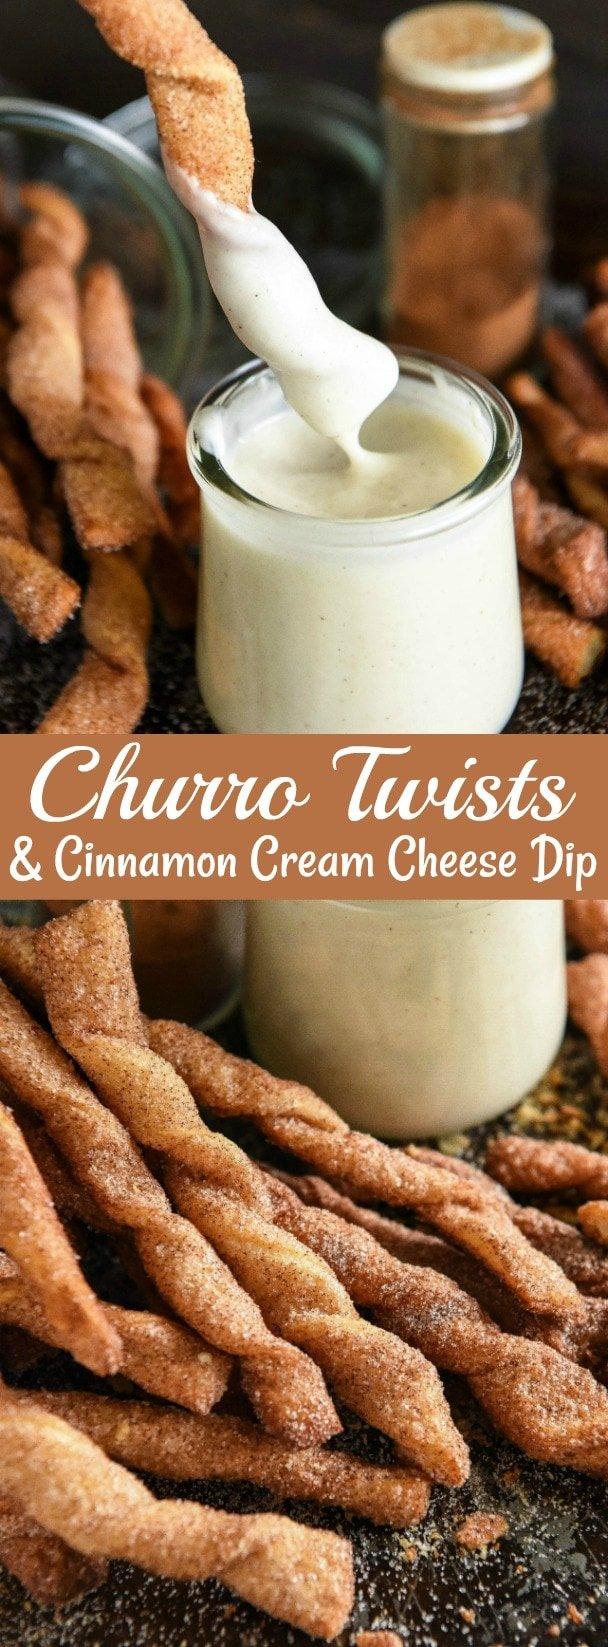 Churro Twists with a Cinnamon Cream Cheese Dip! Just 15 minutes to make! #Churro #CrescentDough #Cinnamon